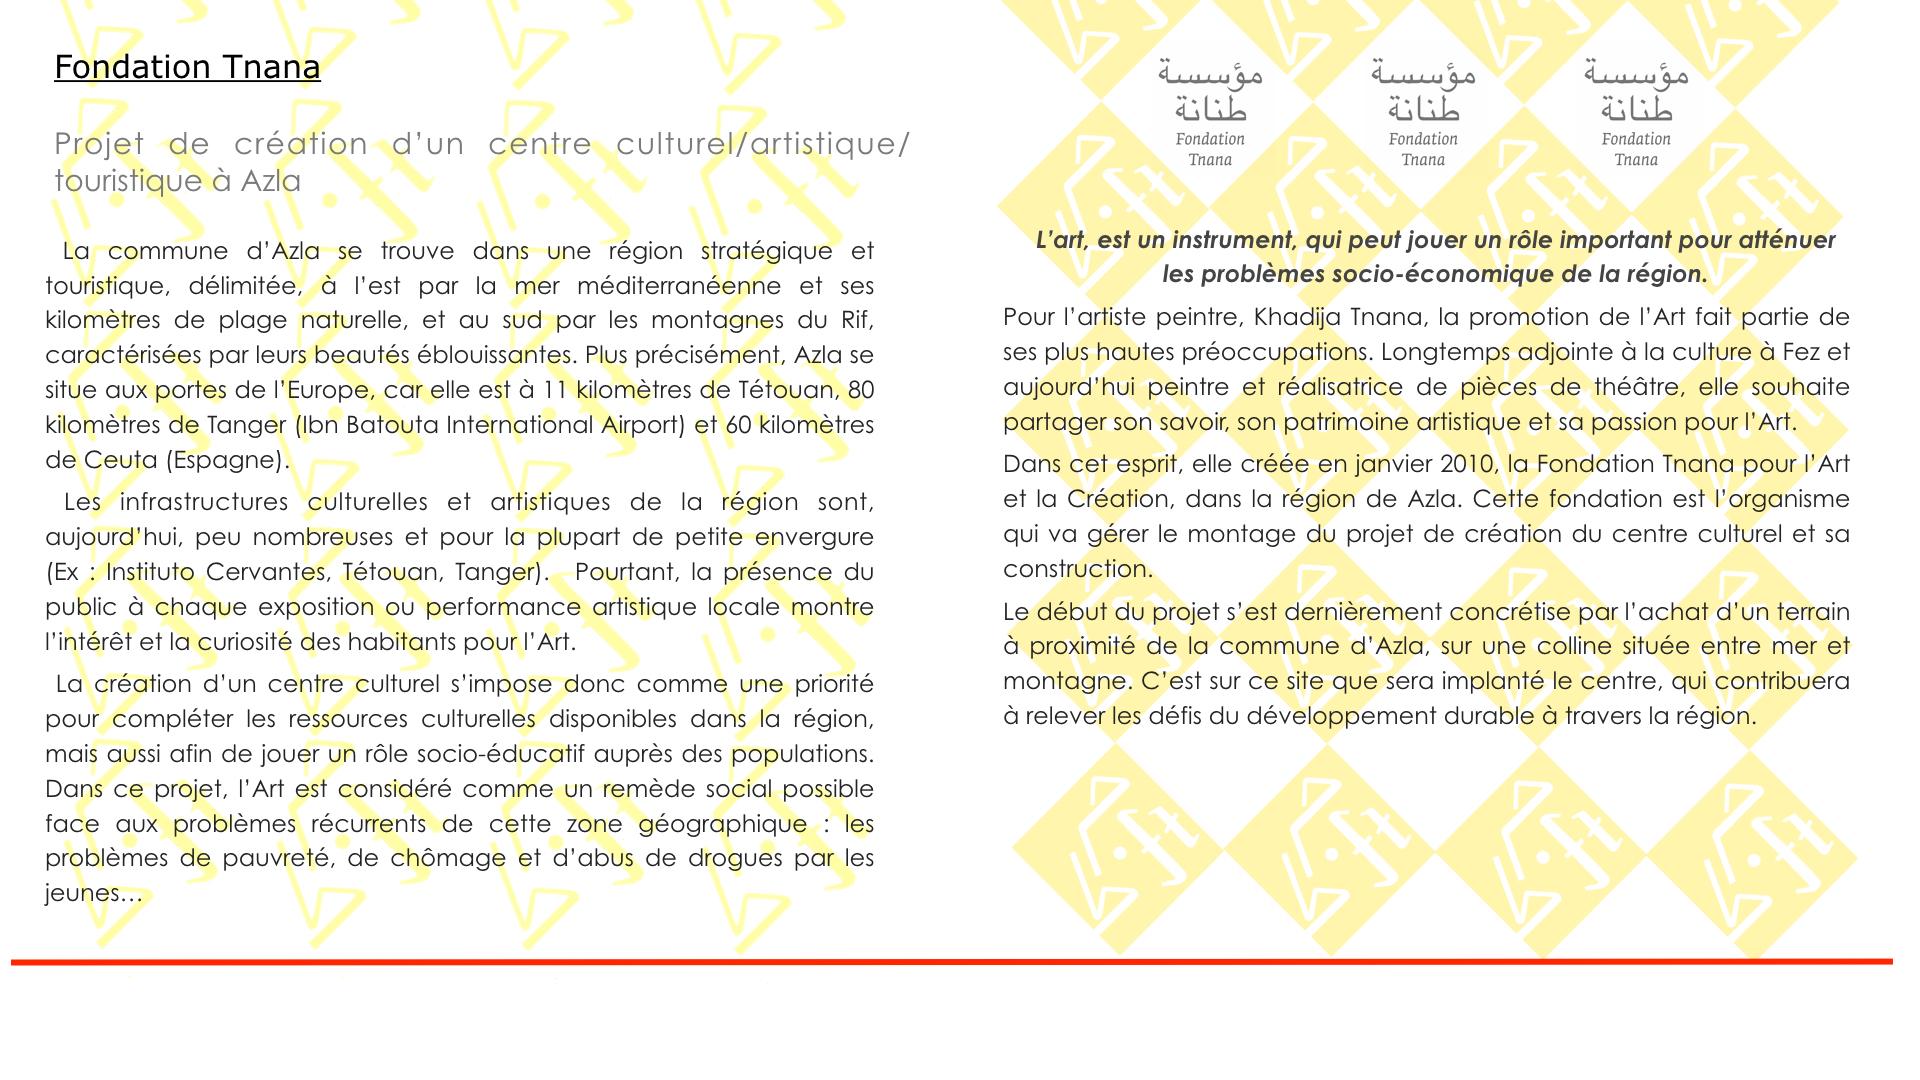 FONDATION TNANA DOSSIER PDF 10.08.17.002.jpeg